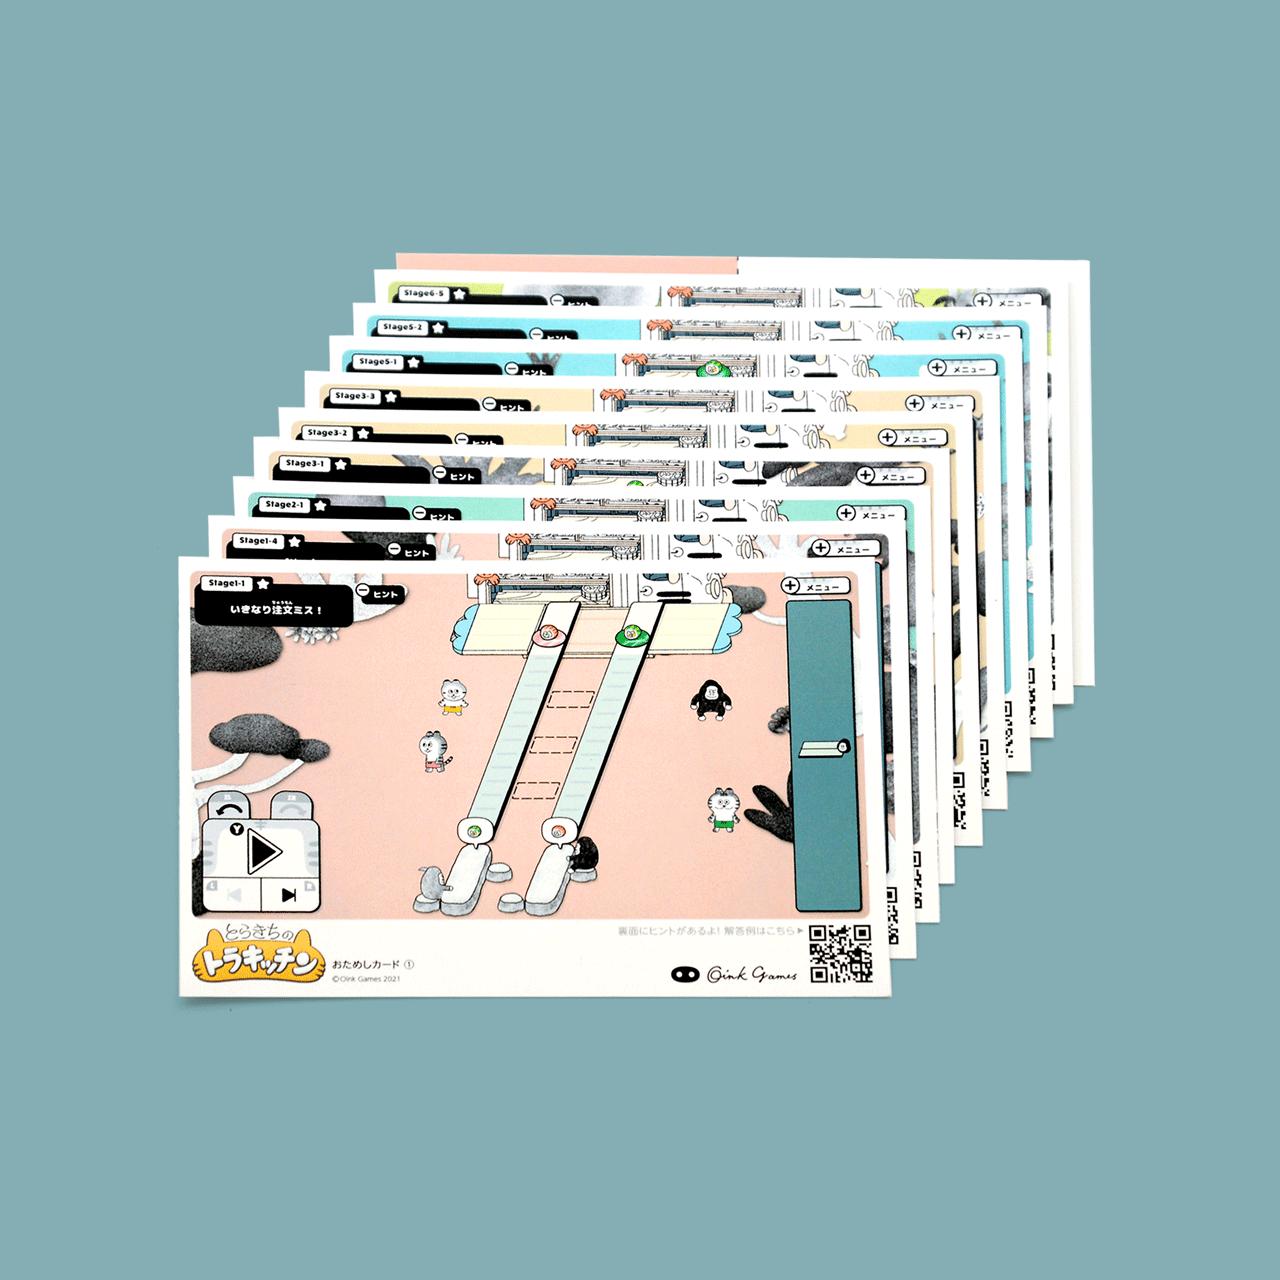 Oink Games Inc FFNRONK Accessories